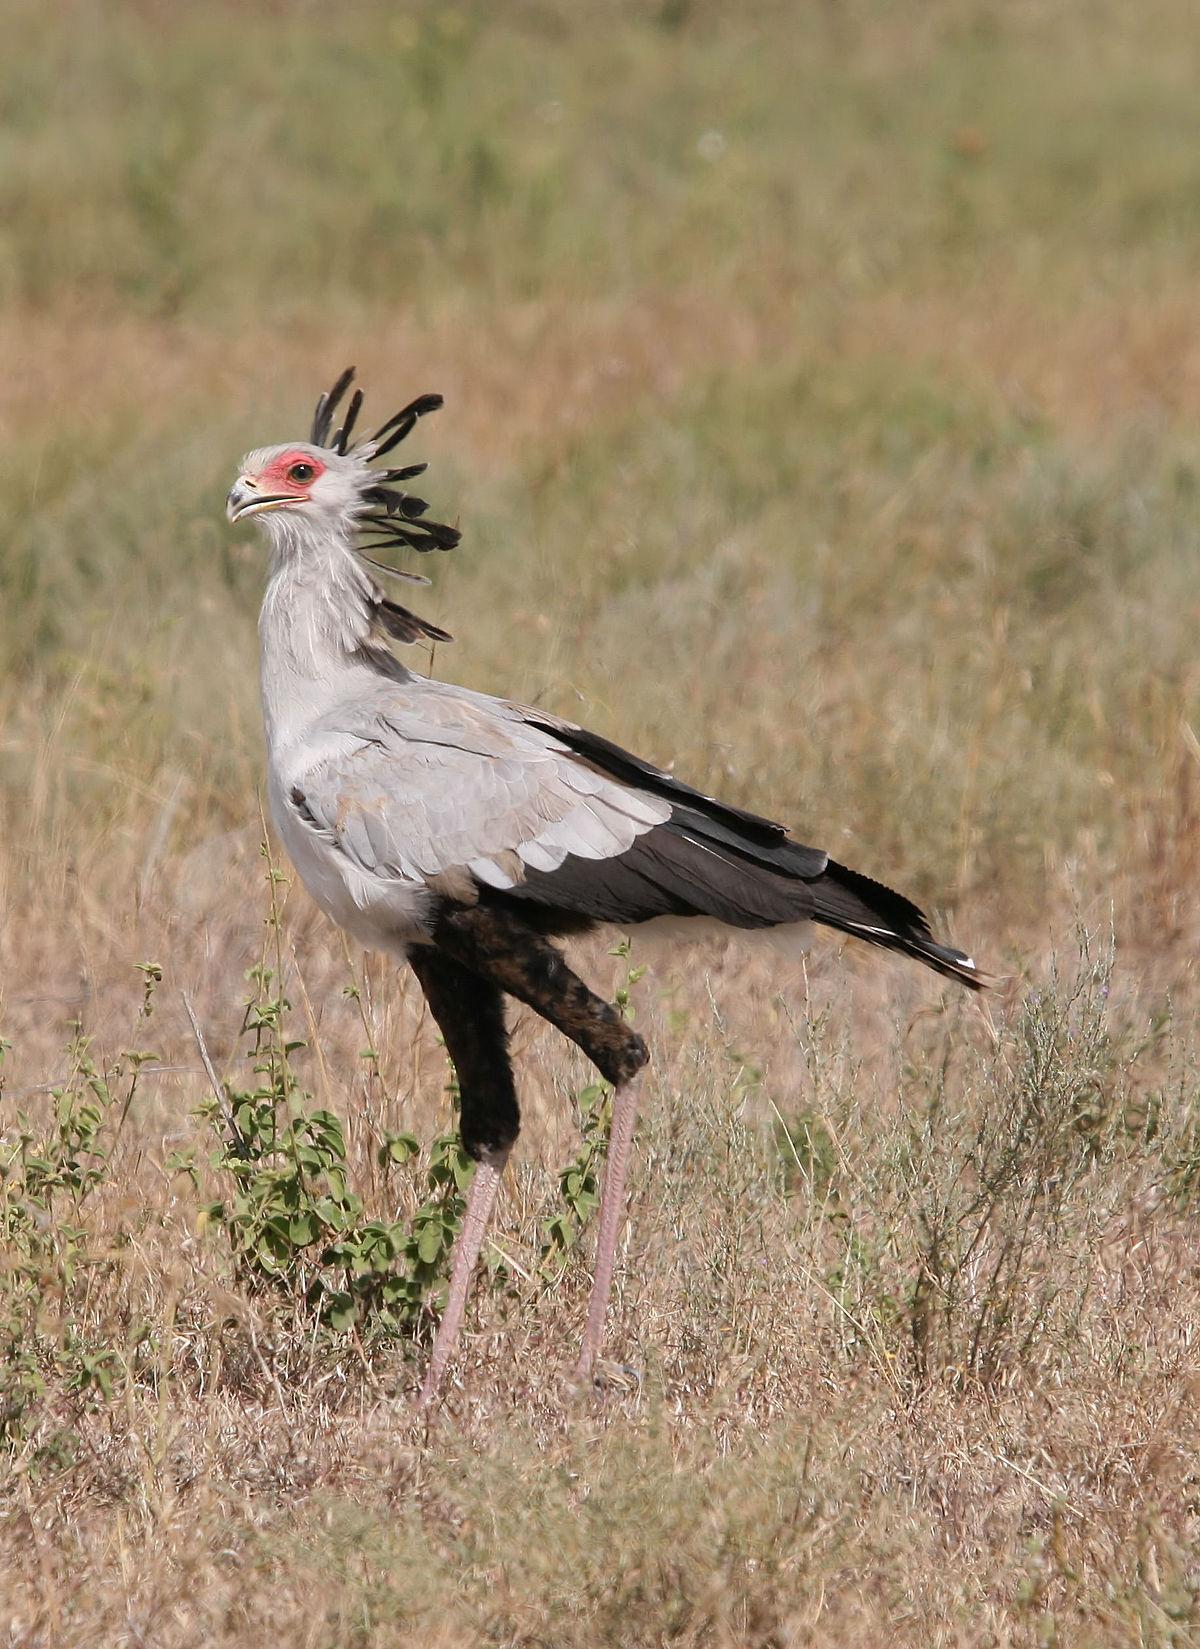 African Grassland Birds Secretarybird - Wikipe...